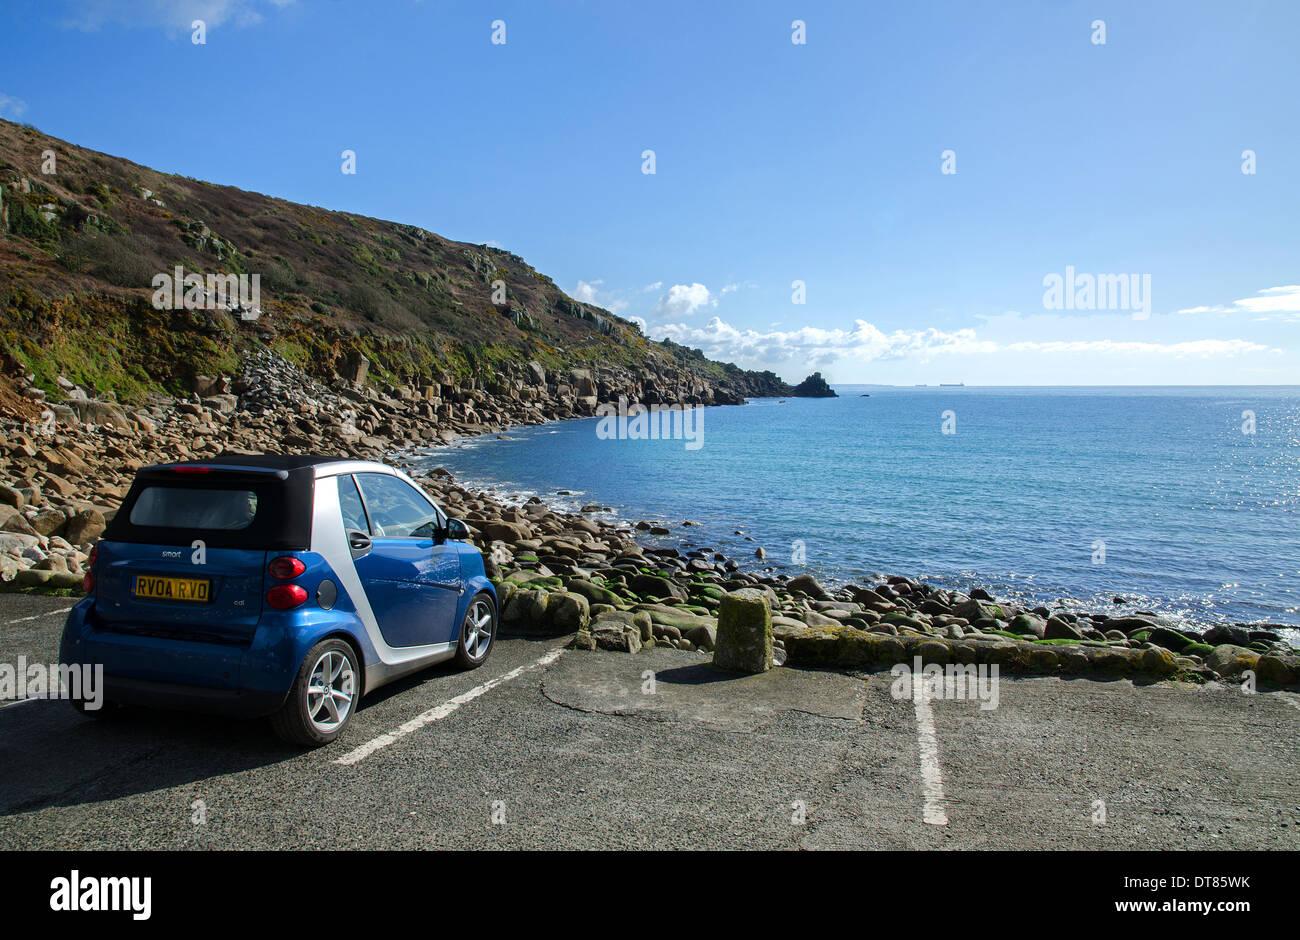 a car parked in the carpark at Lamorna cove, Cornwall, UK - Stock Image